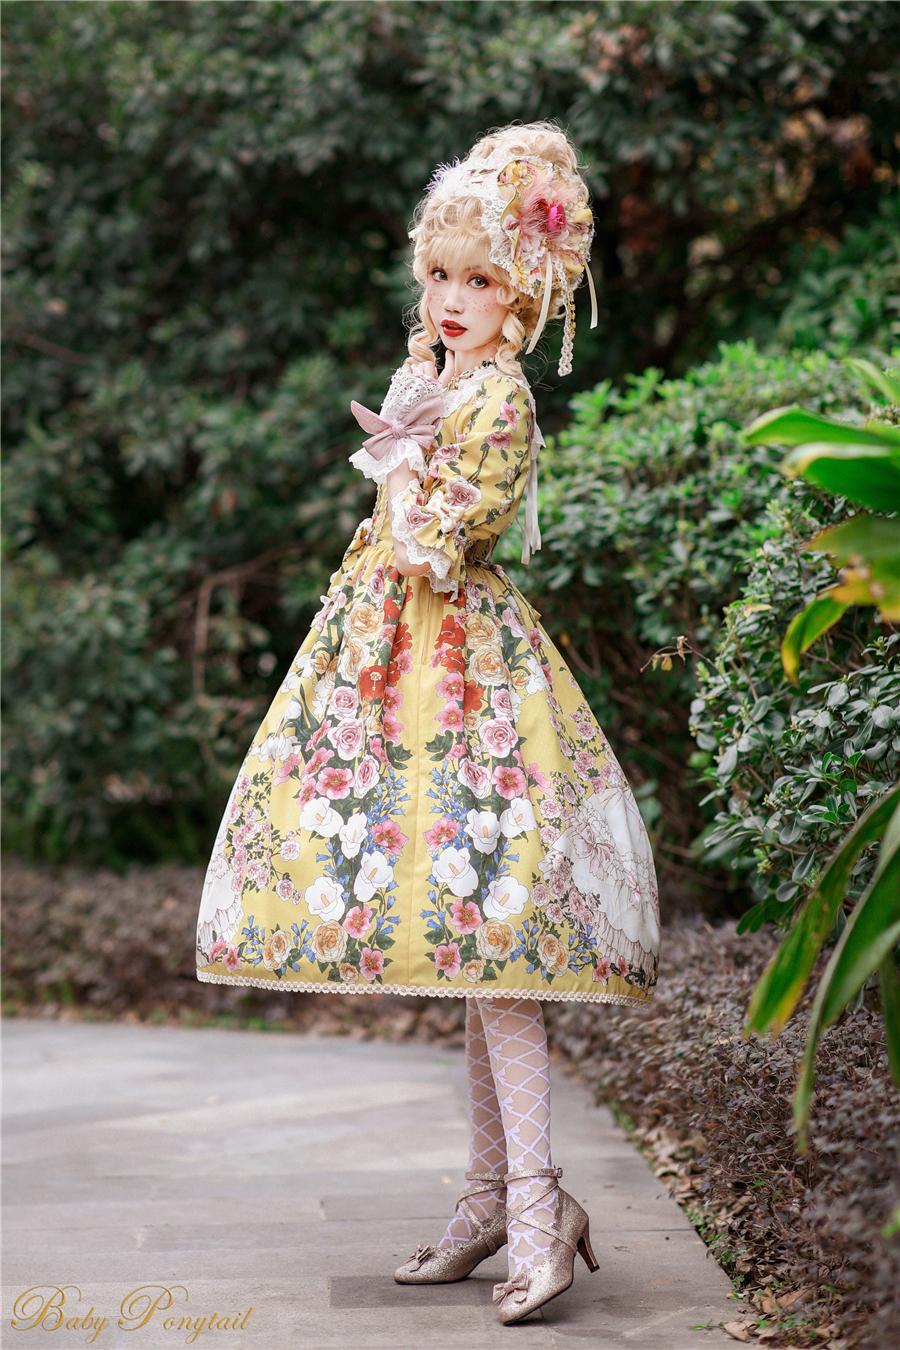 Baby Ponytail_Model Photo_Polly's Garden of Dreams_OP Yellow_Kaka_25.jpg